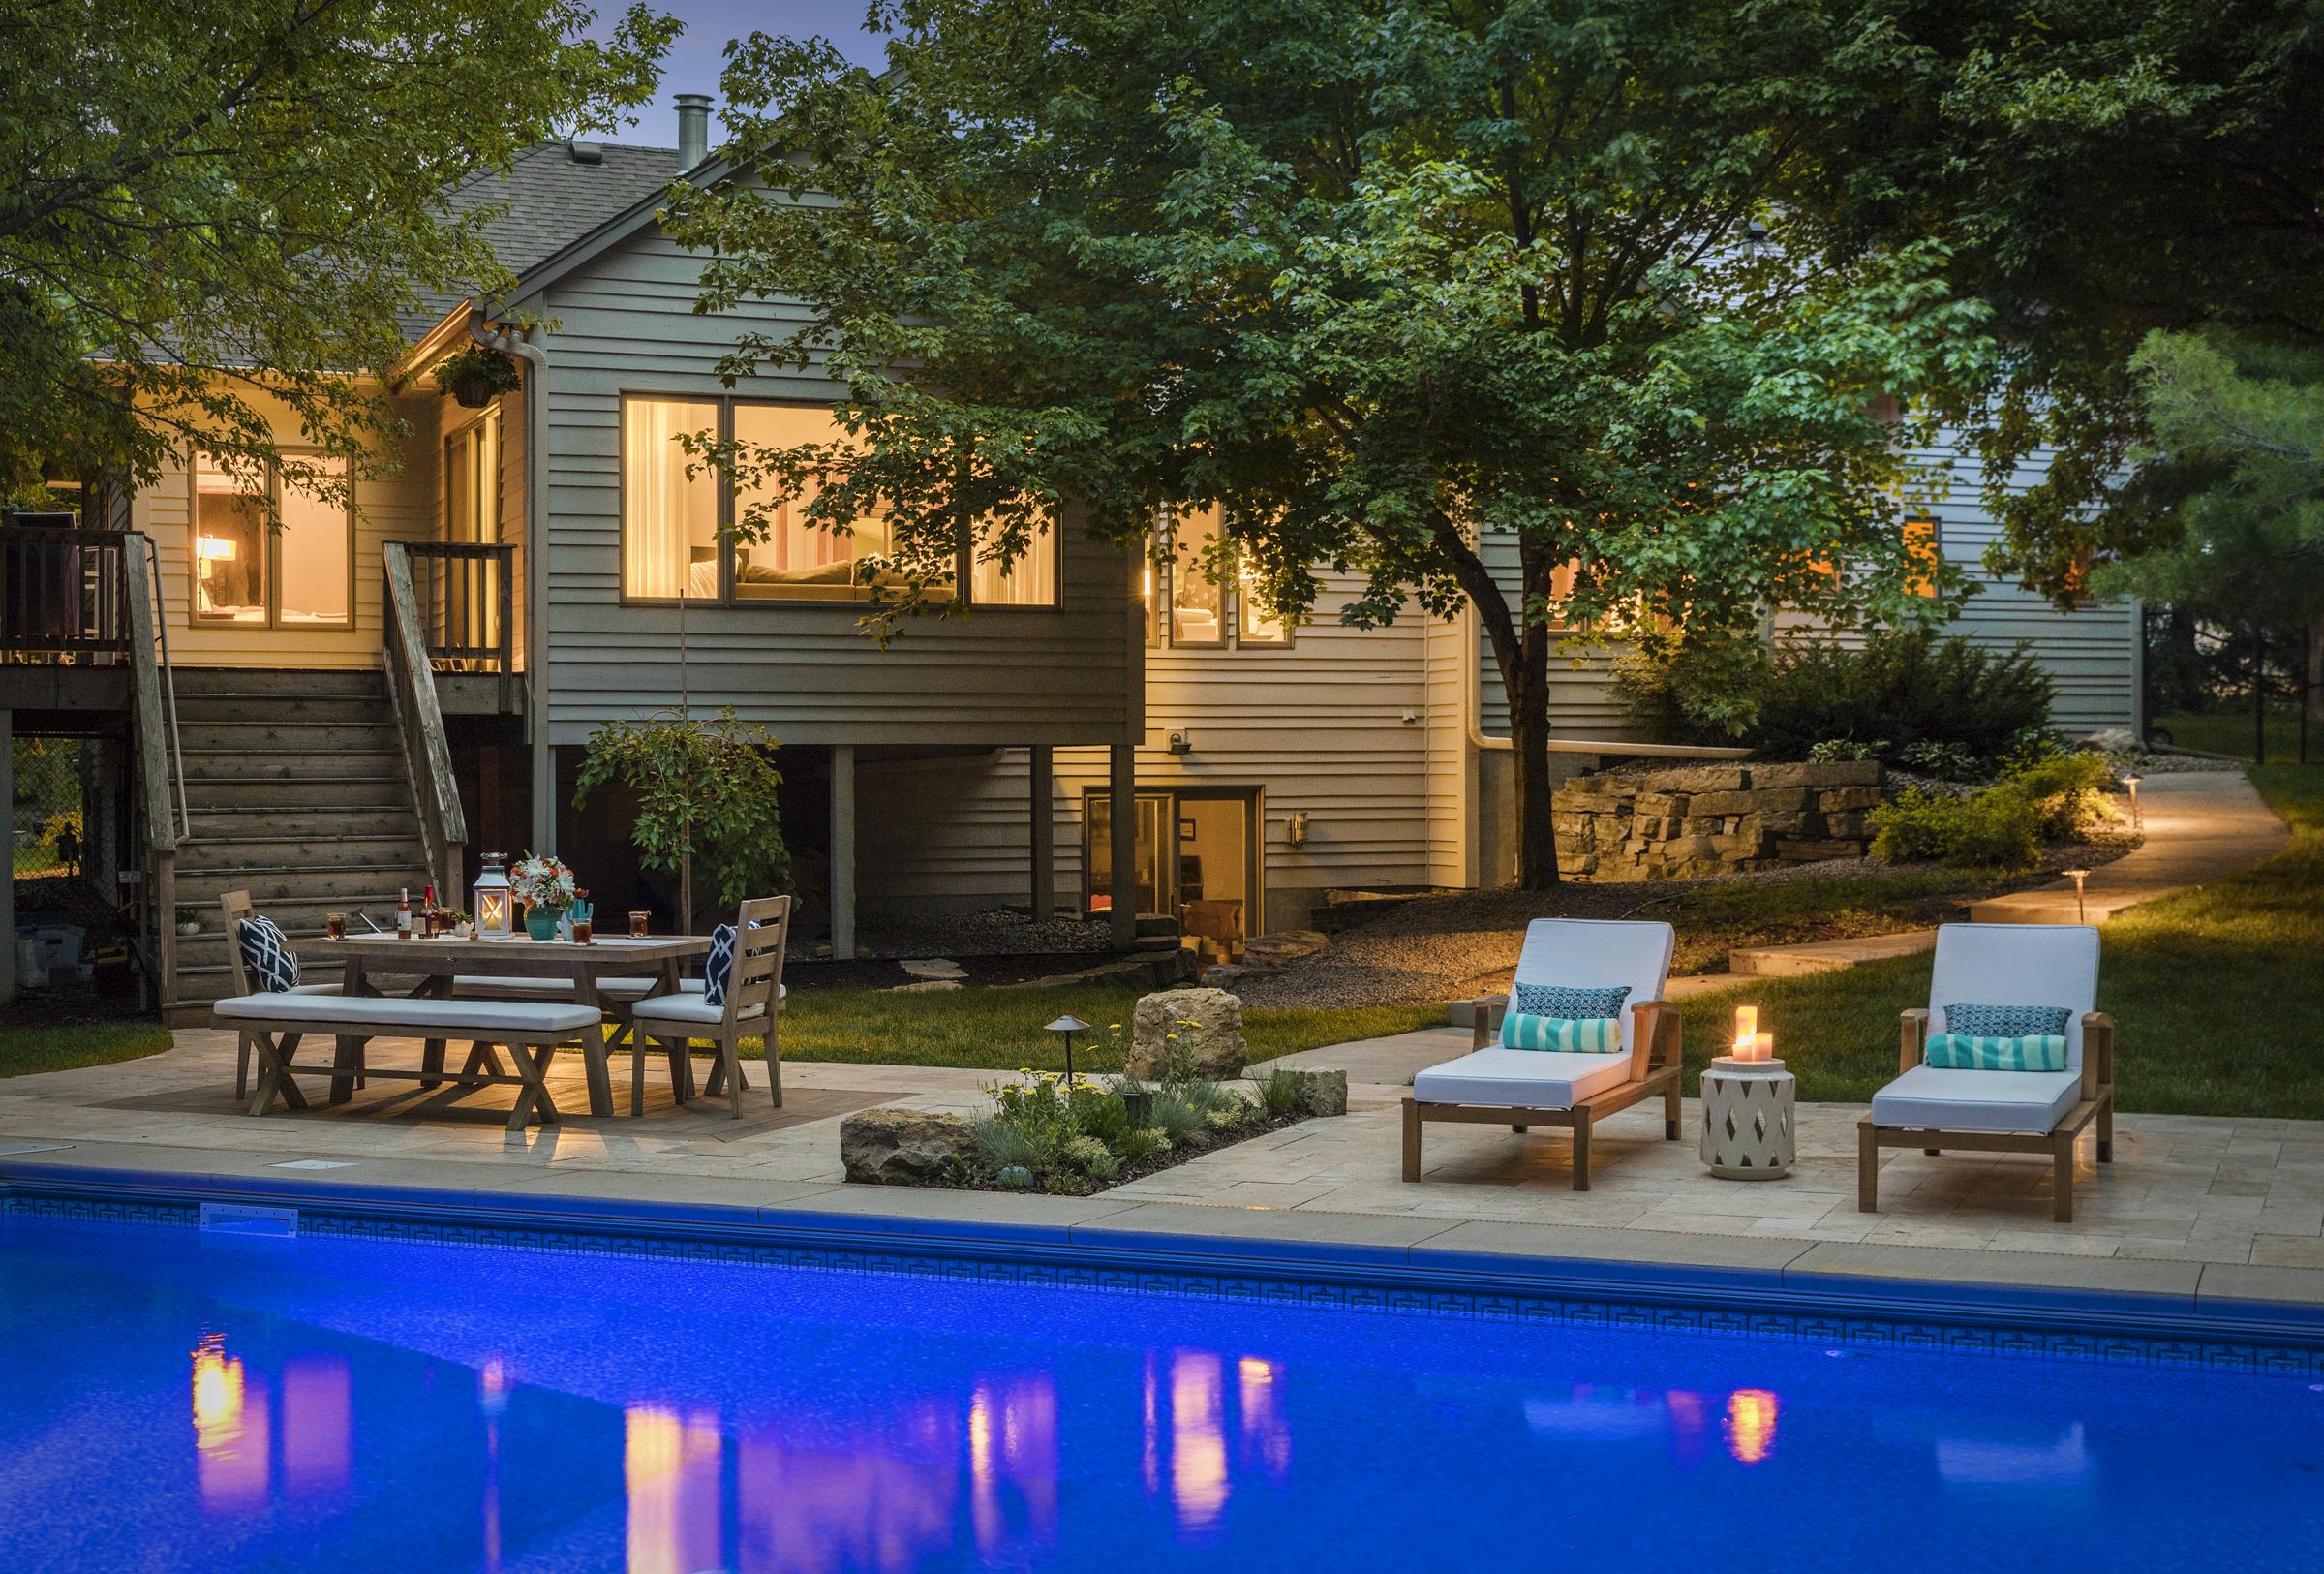 Mom's Design Build - Design Build Concrete Pool Surround Modern Poolside Furniture